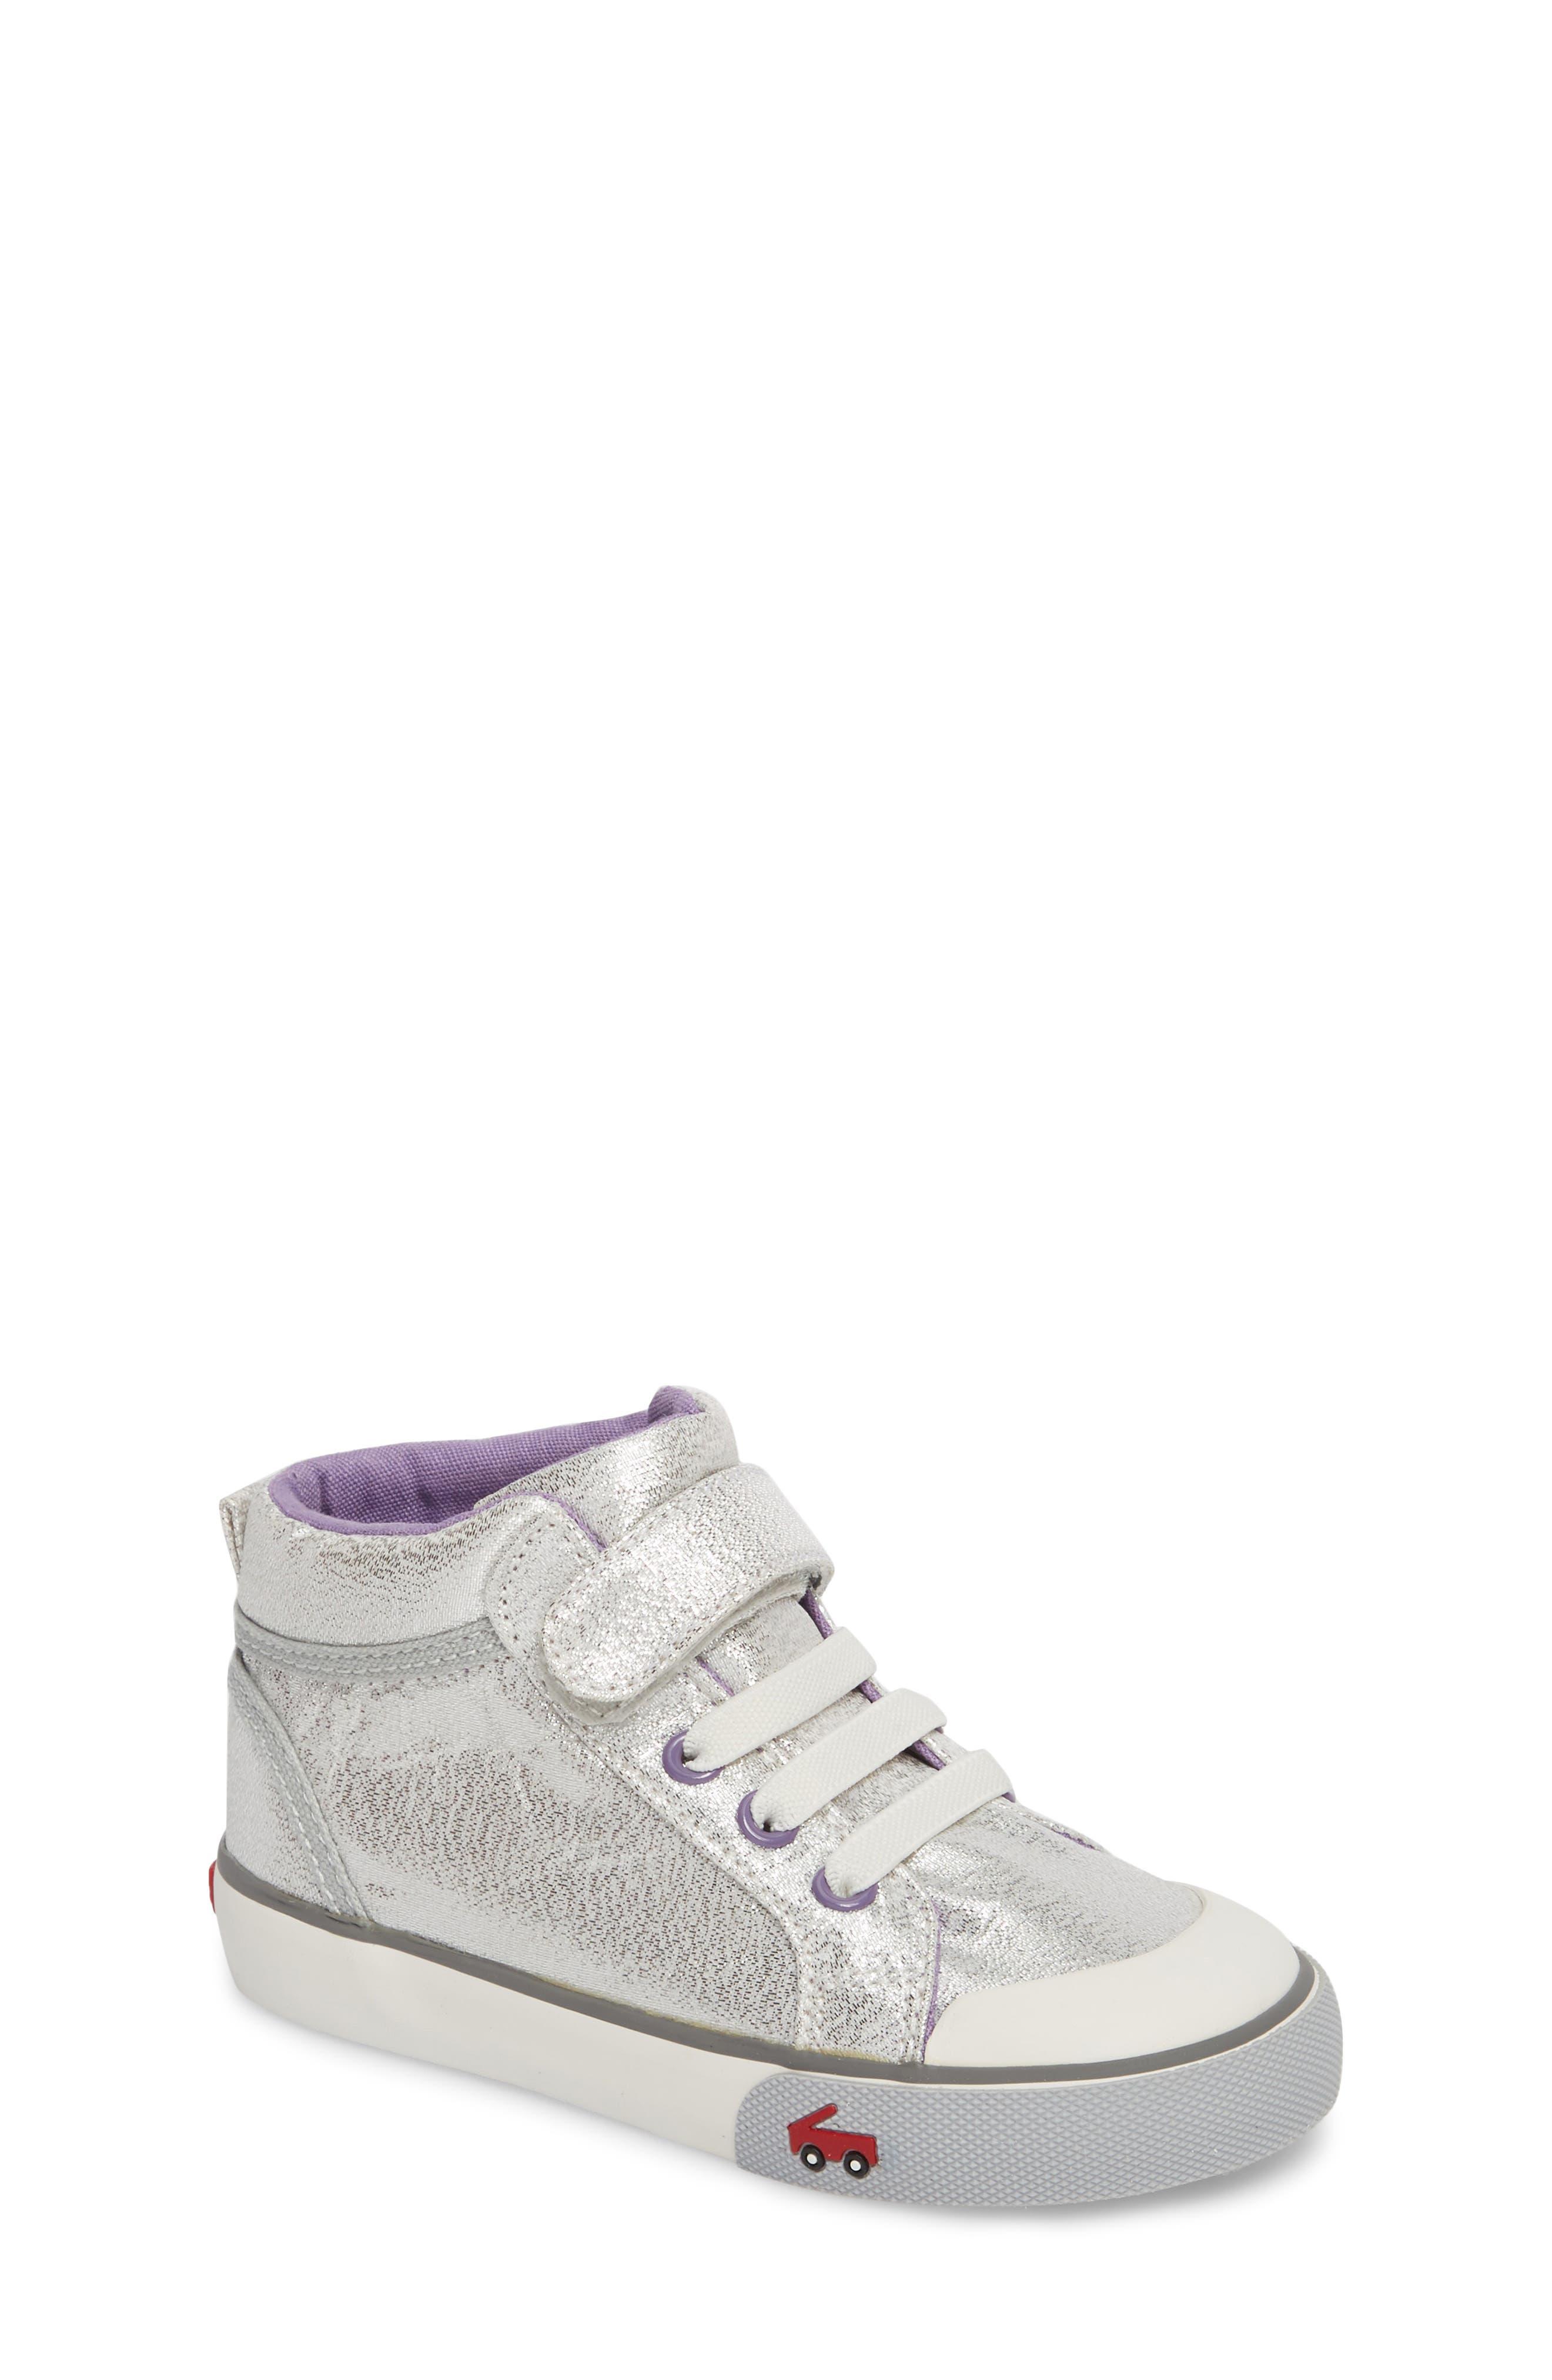 Peyton Metallic Mid Top Sneaker,                             Main thumbnail 1, color,                             SILVER GLITTER